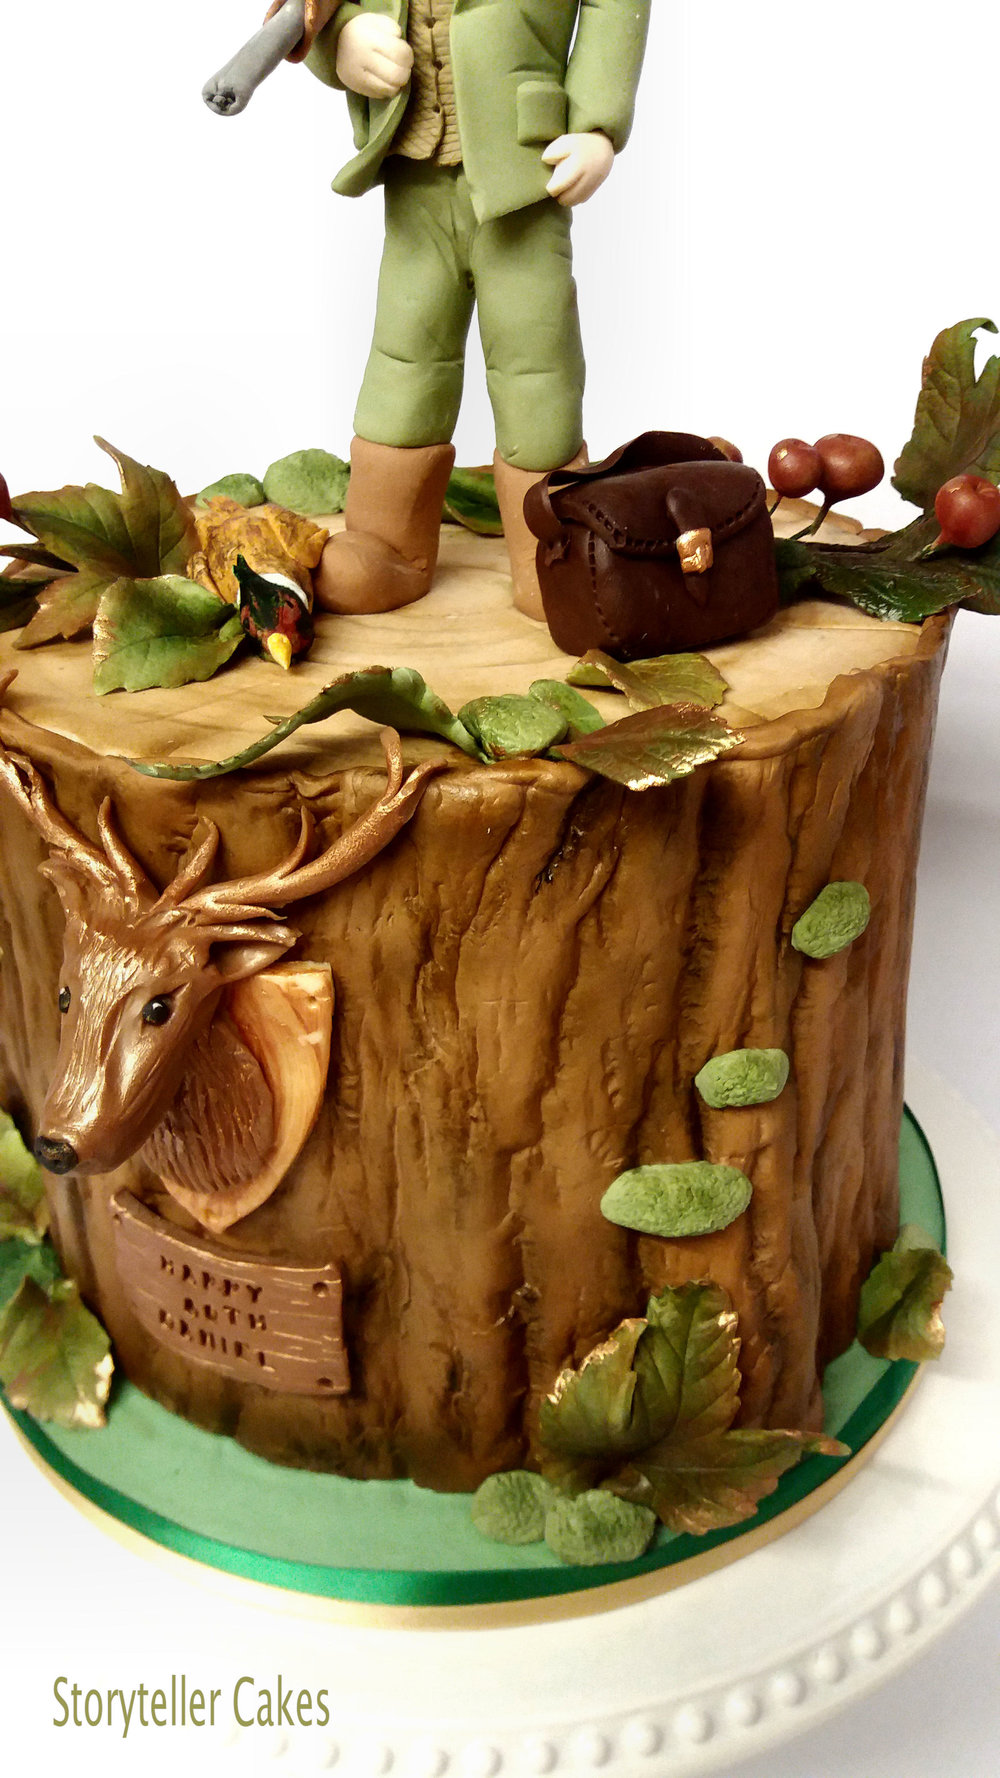 Huntsman cake 3.jpg